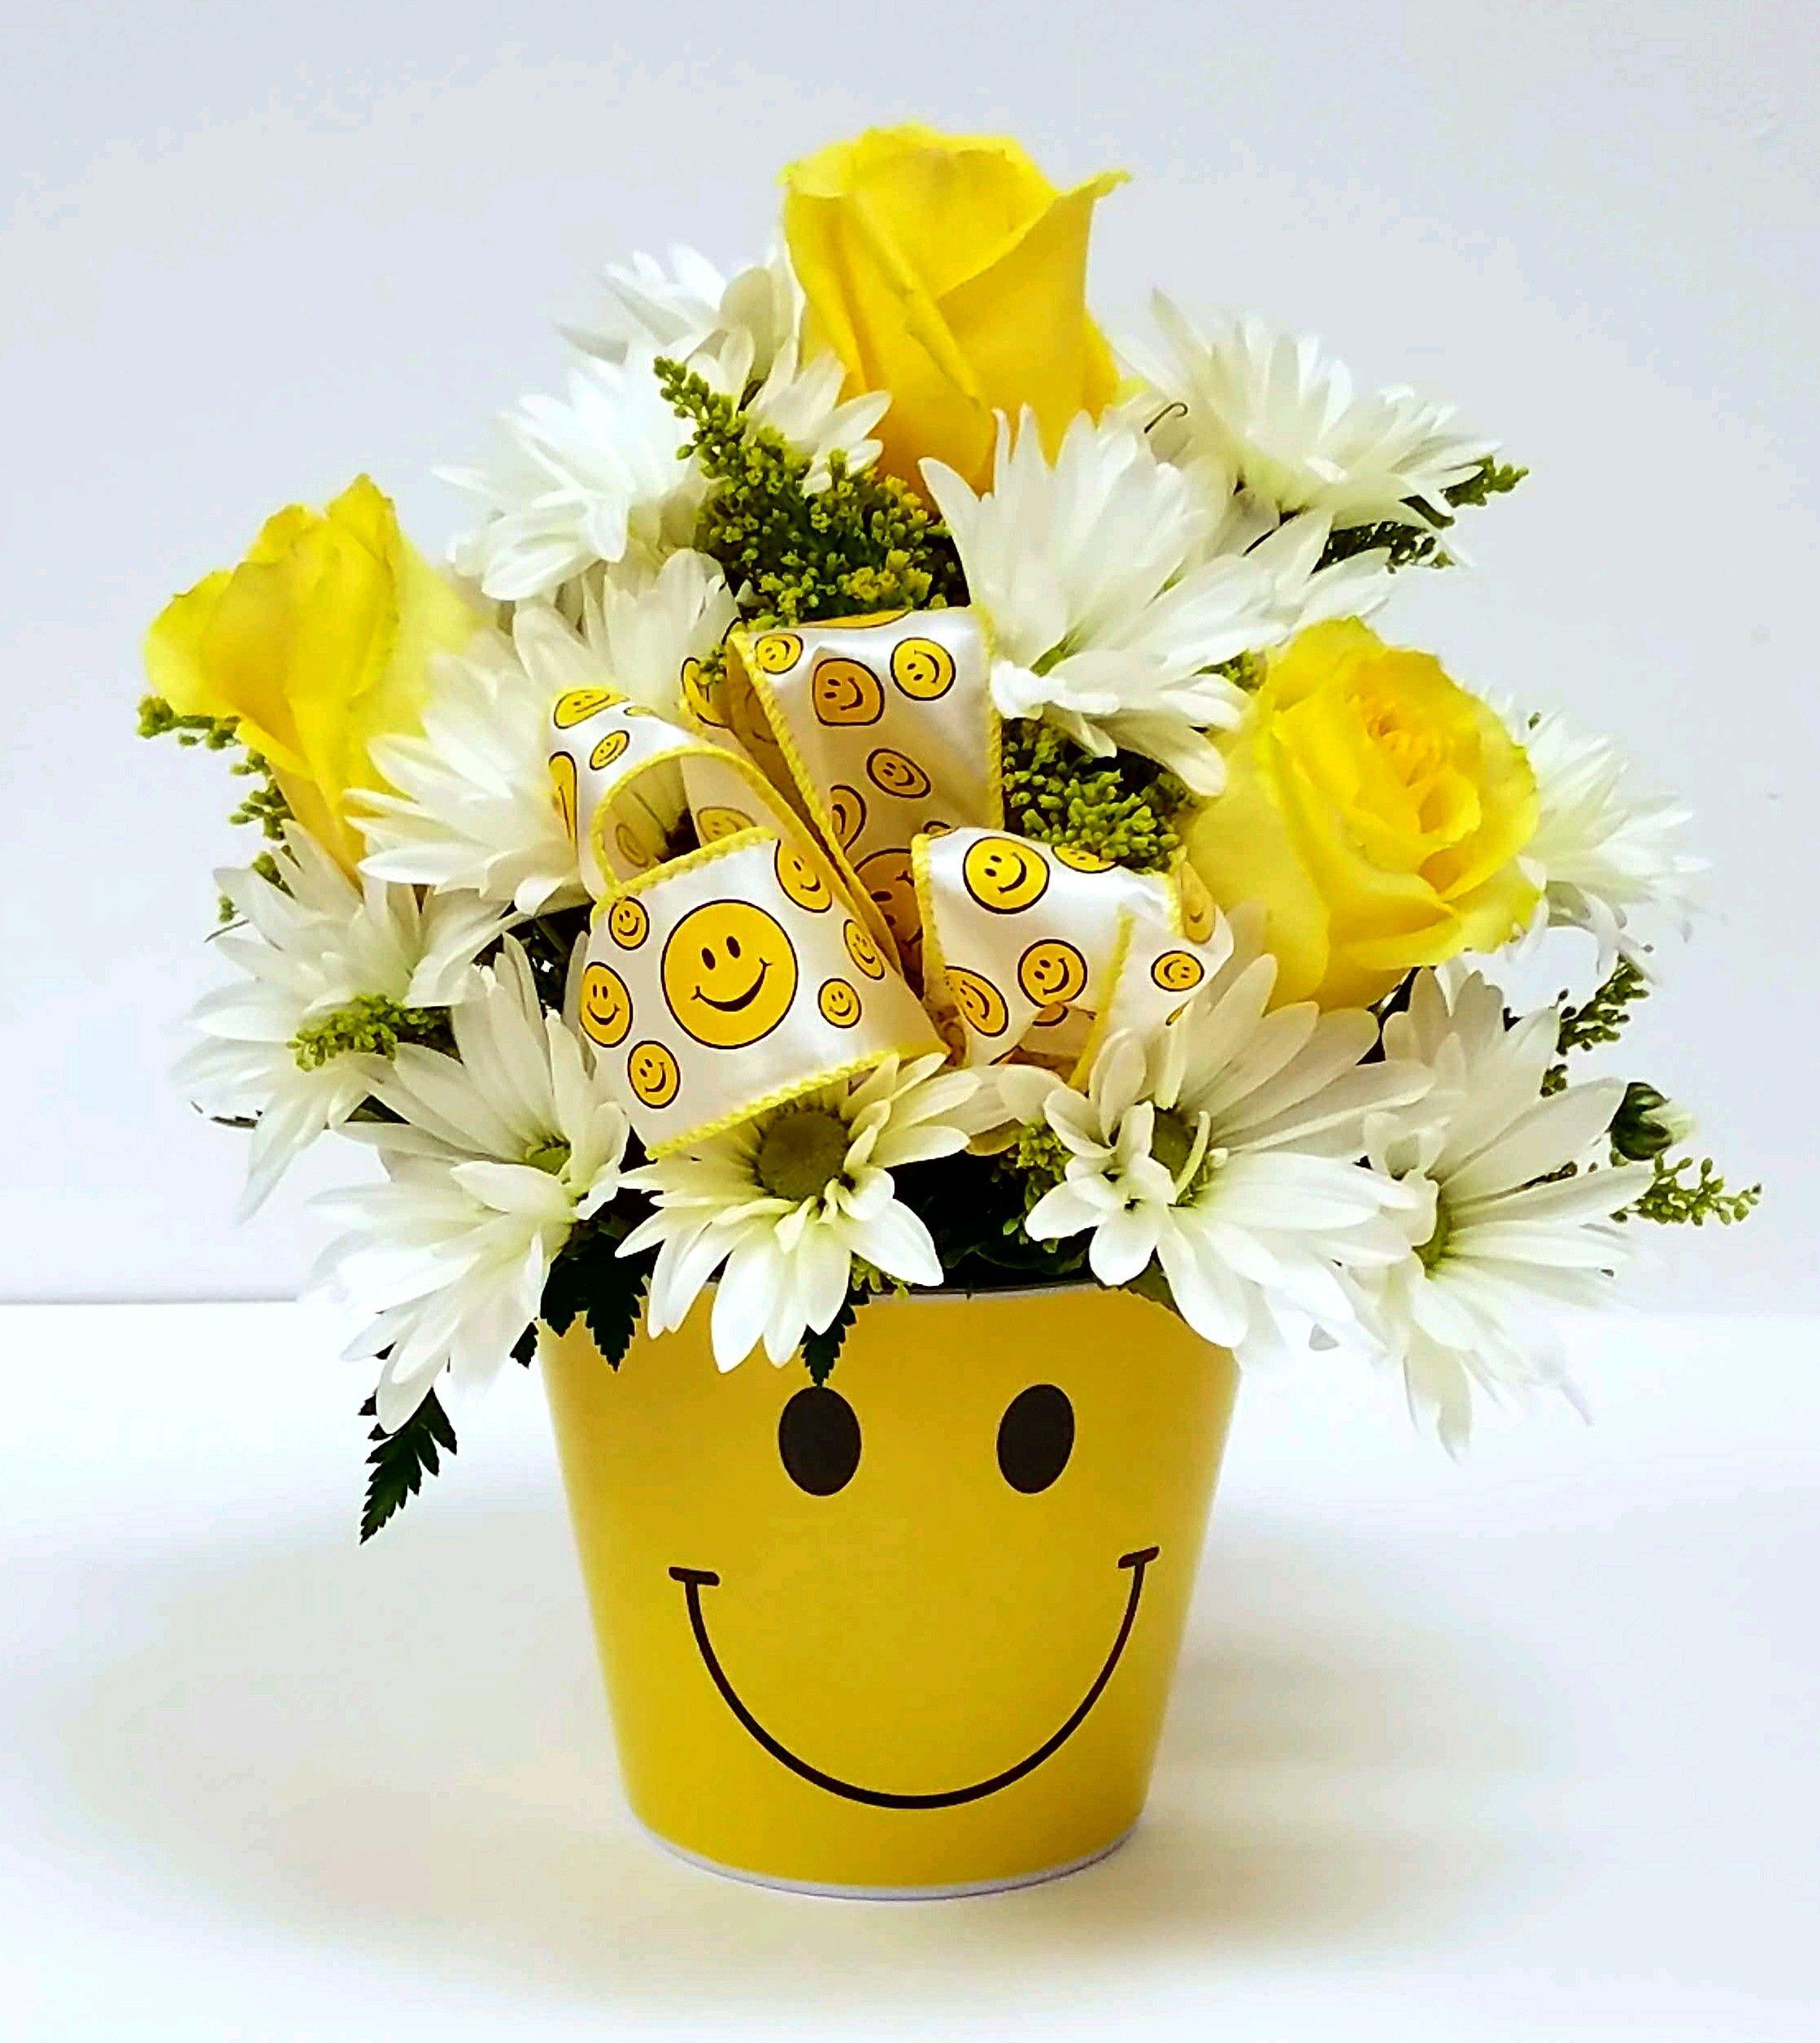 Smile face bouquet norman florist flower shop in flanders livingston izmirmasajfo